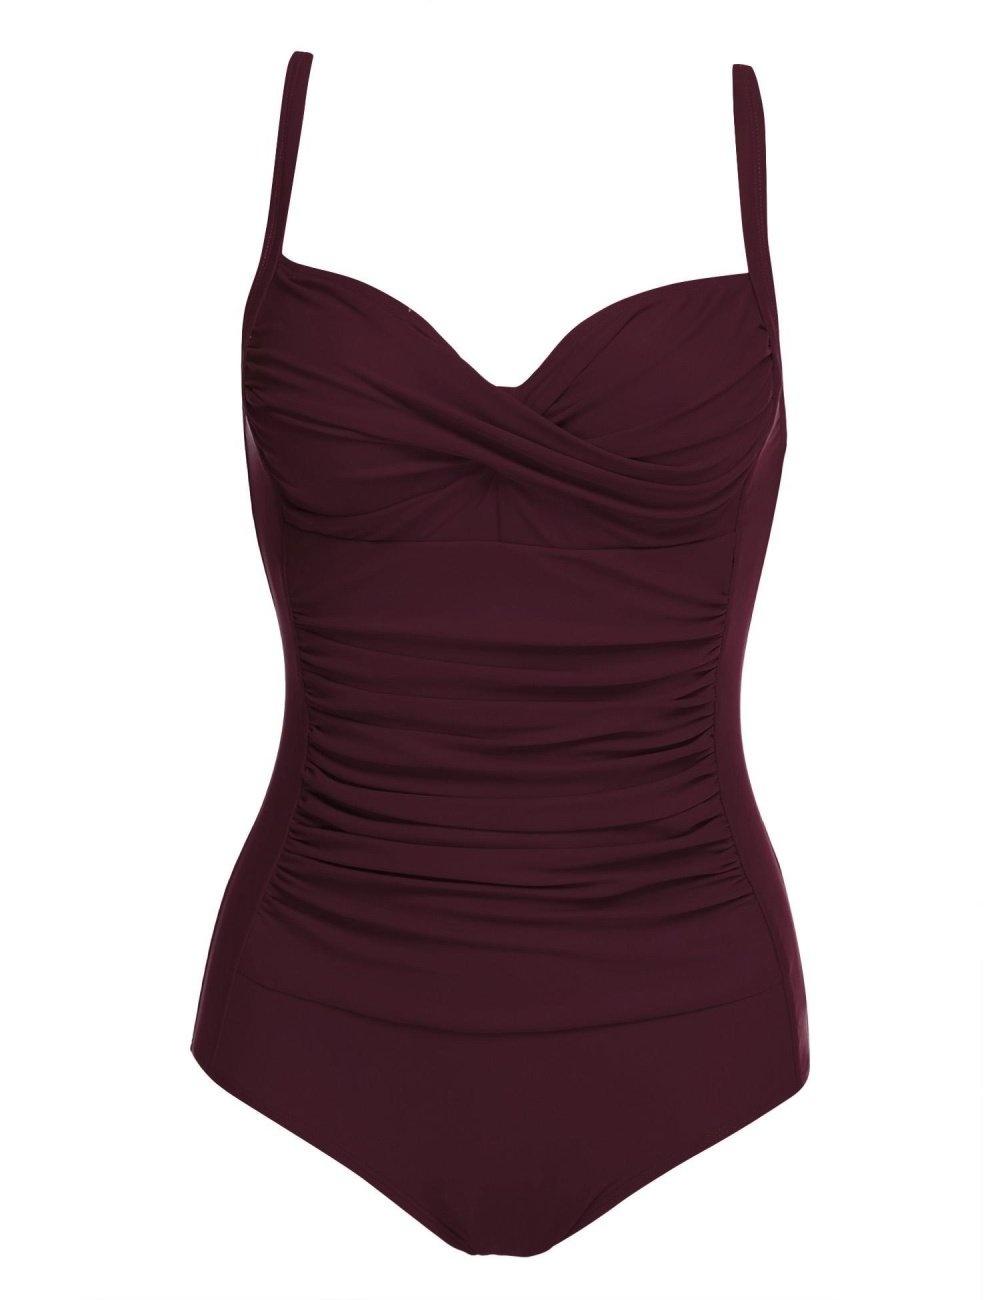 4a43541328 Topsellers365 Best For Women Summer Beach Swimwear Bikini Swimsuits ...